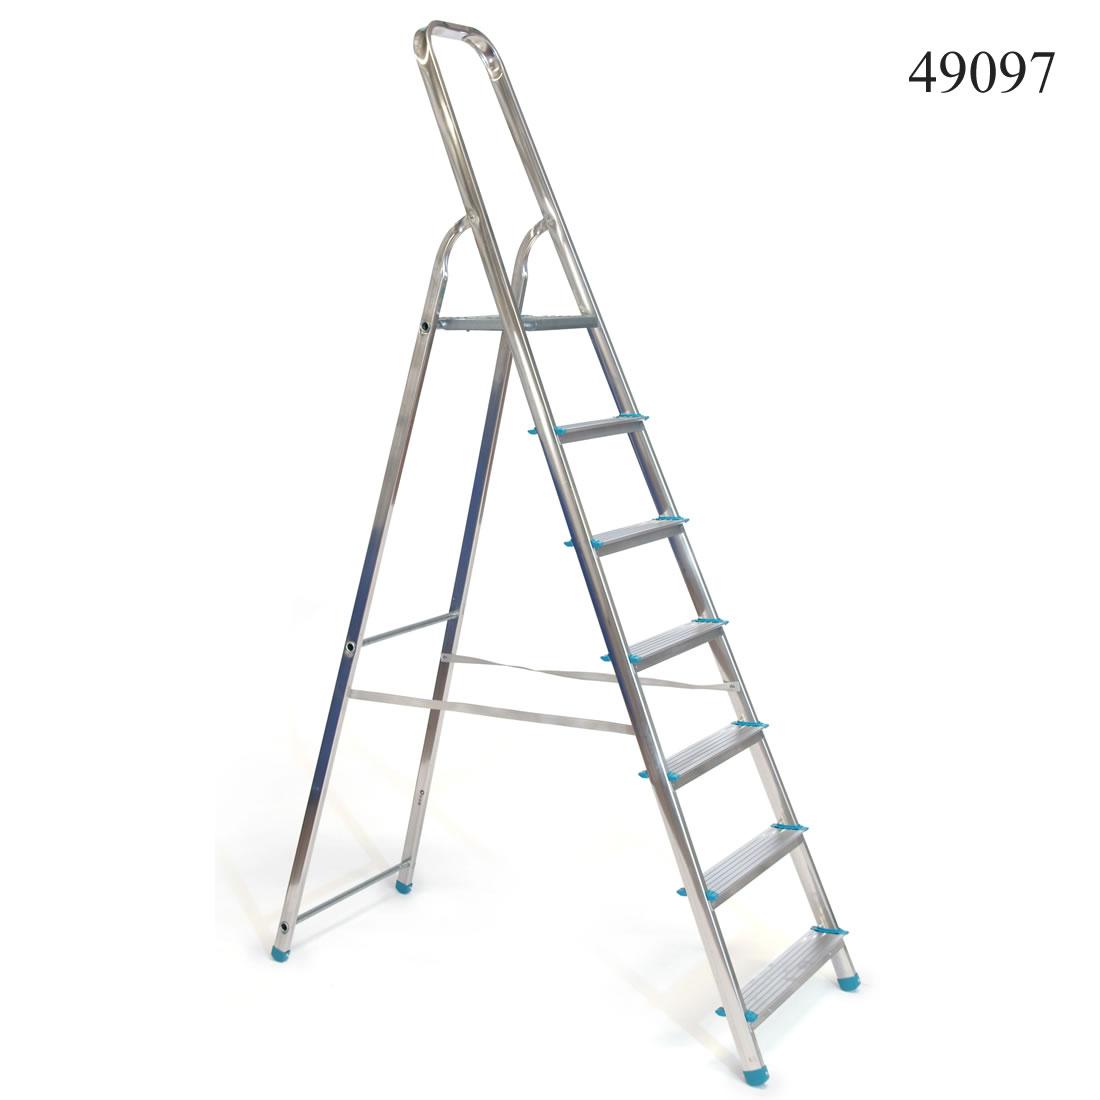 3,53m (model 49097)